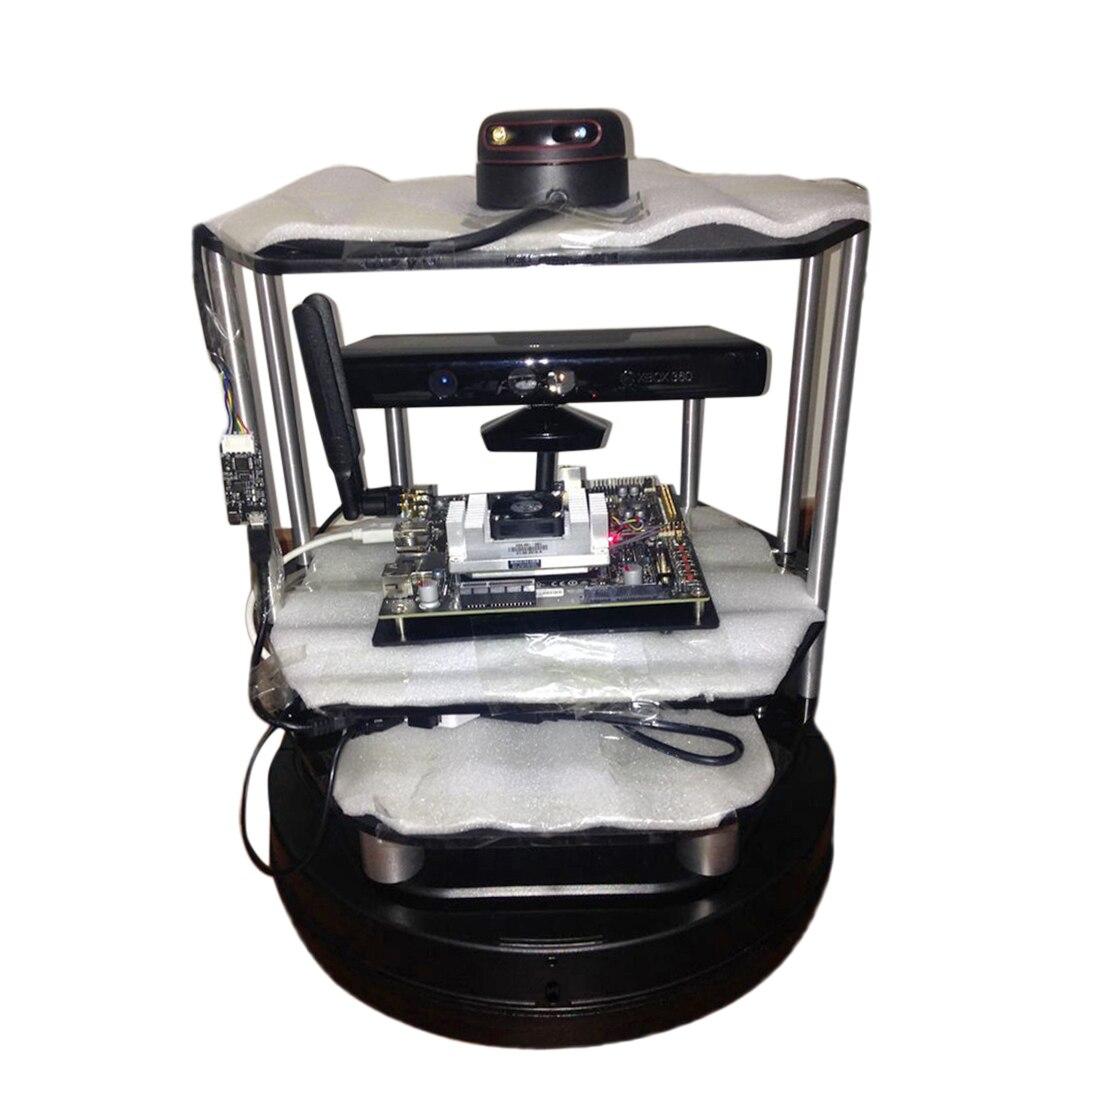 Robot Operating System Robot Car Open Source Kit Educational Learning Kit For Children Kids Developmental Early Educational Toys